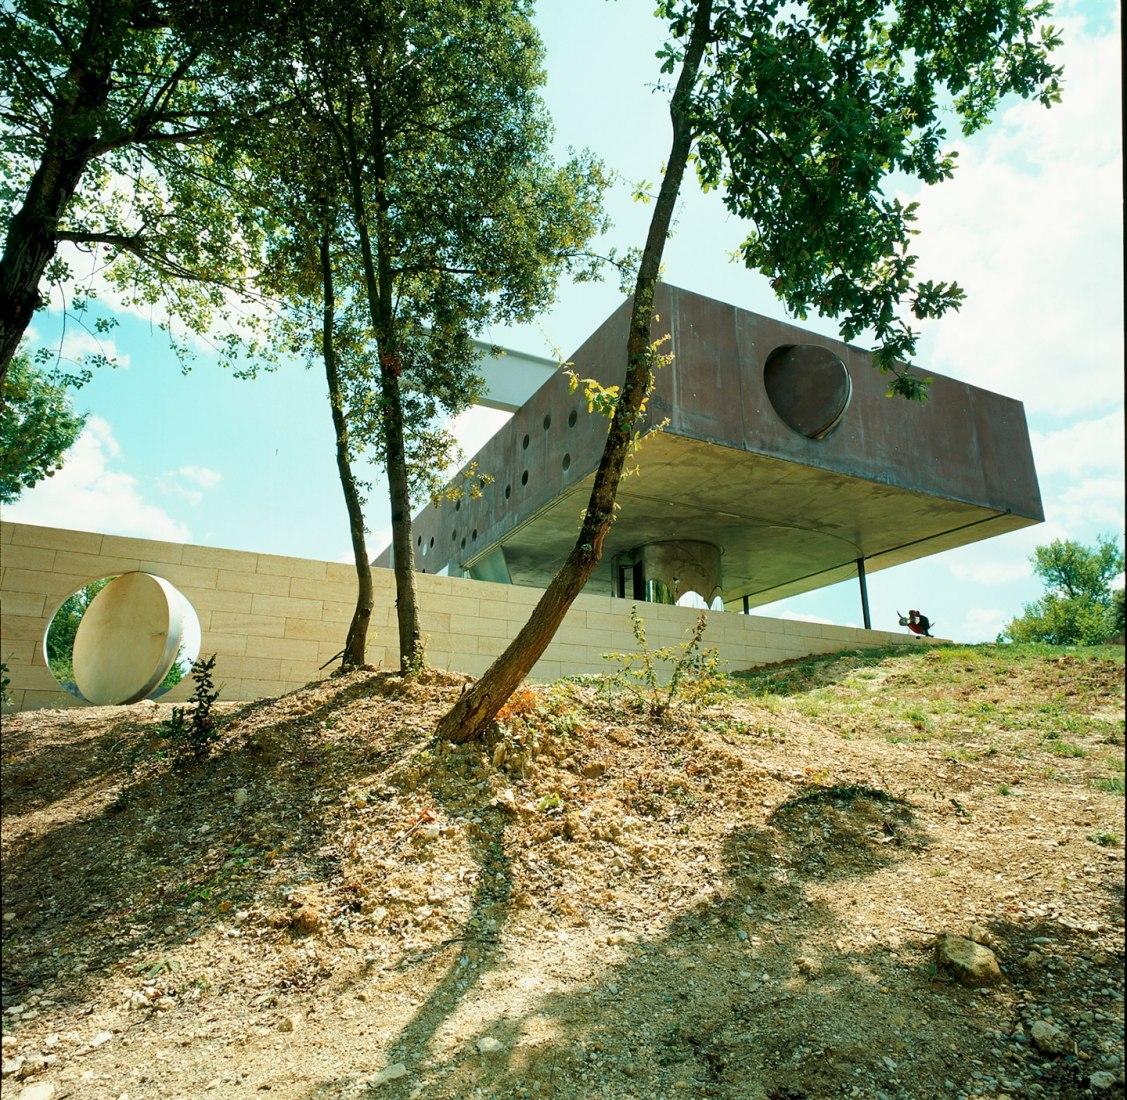 Vista exterior. Maison à Bordeaux por Rem Koolhaas. Fotografía © Hans Werlemann. Cortesía de OMA